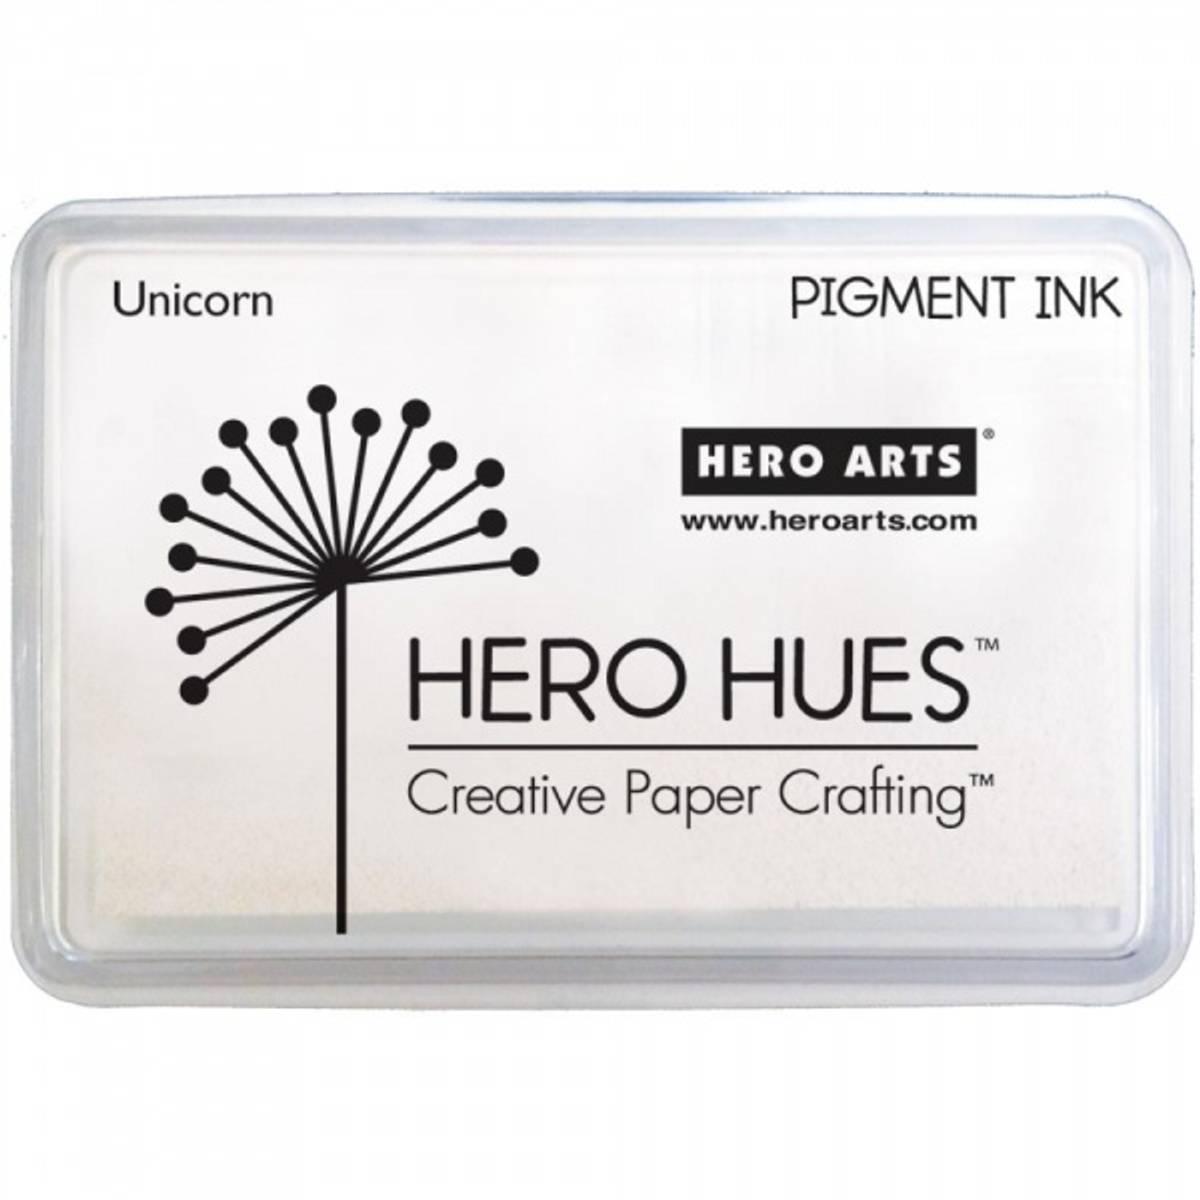 Hero Hues Unicorn